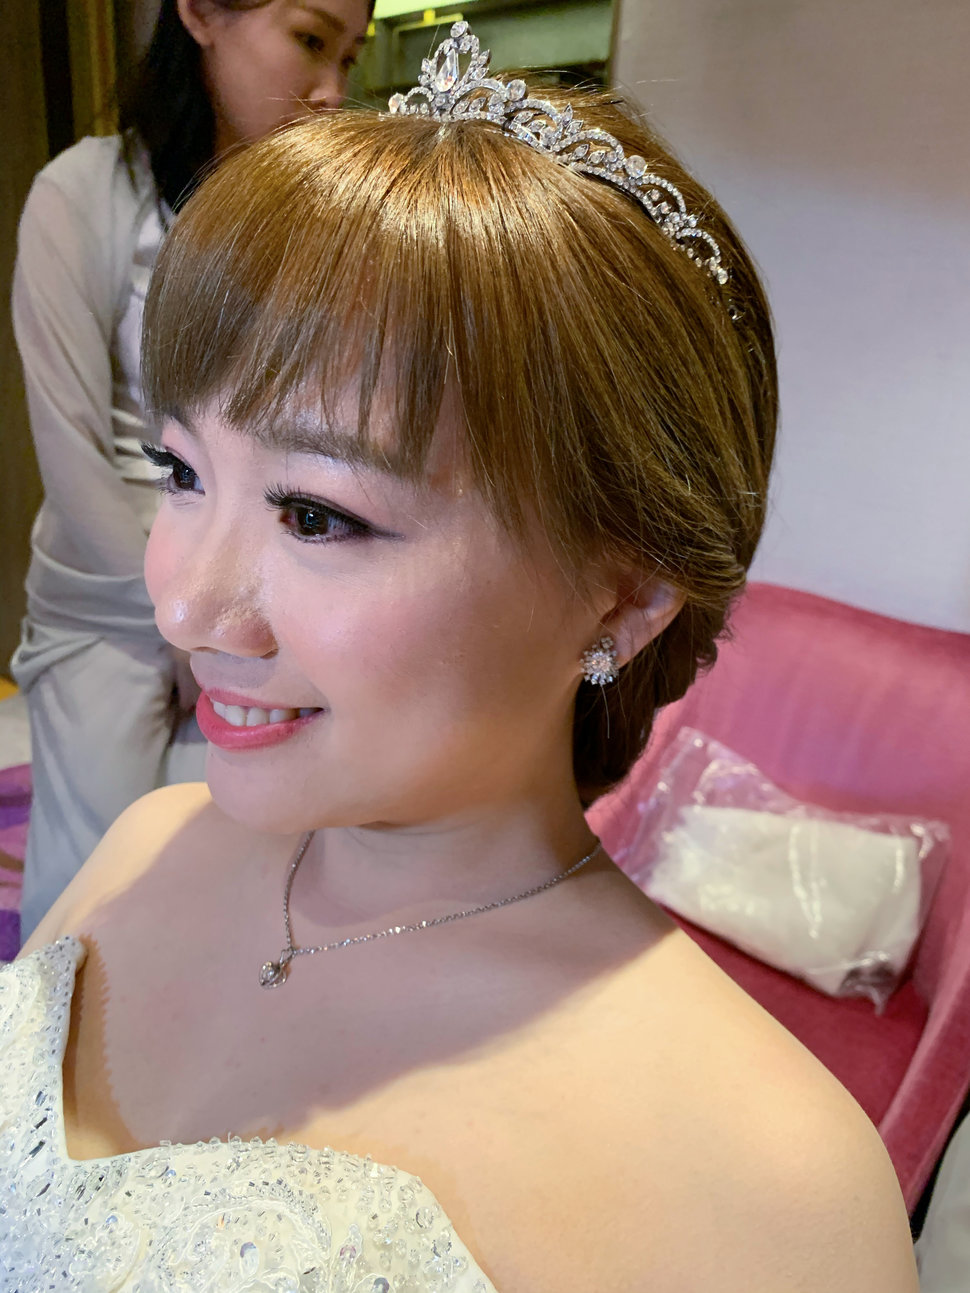 3C039E89-8FFE-43FC-B346-2EC02F058928 - Jojo chen Makeup新娘秘書《結婚吧》